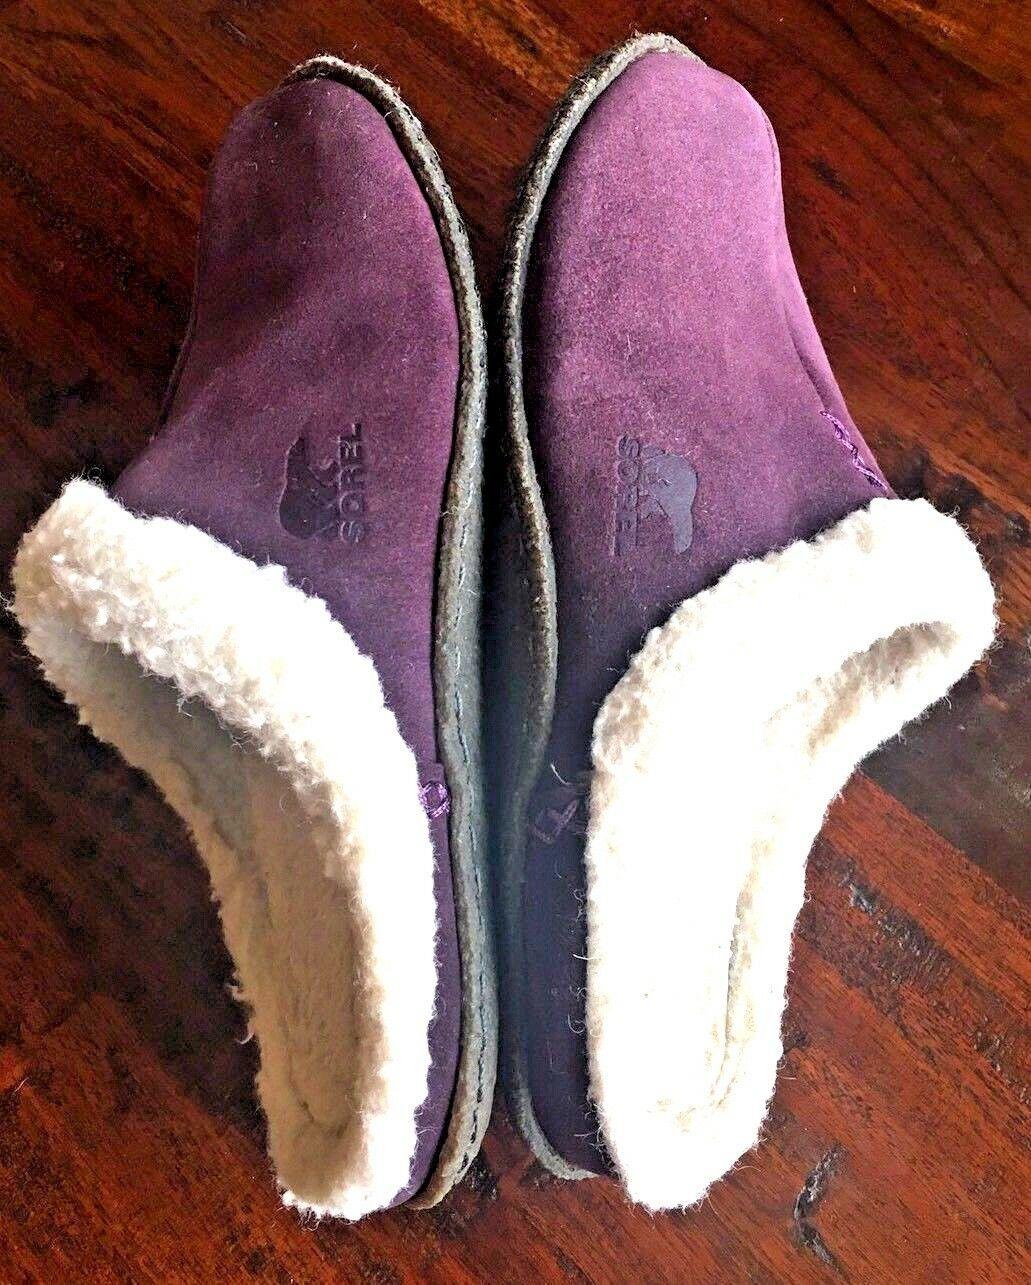 SOREL 9381 Womens Nakiska LILAC Purple Suede Clog Slippers Shoes 6 M #176 image 2